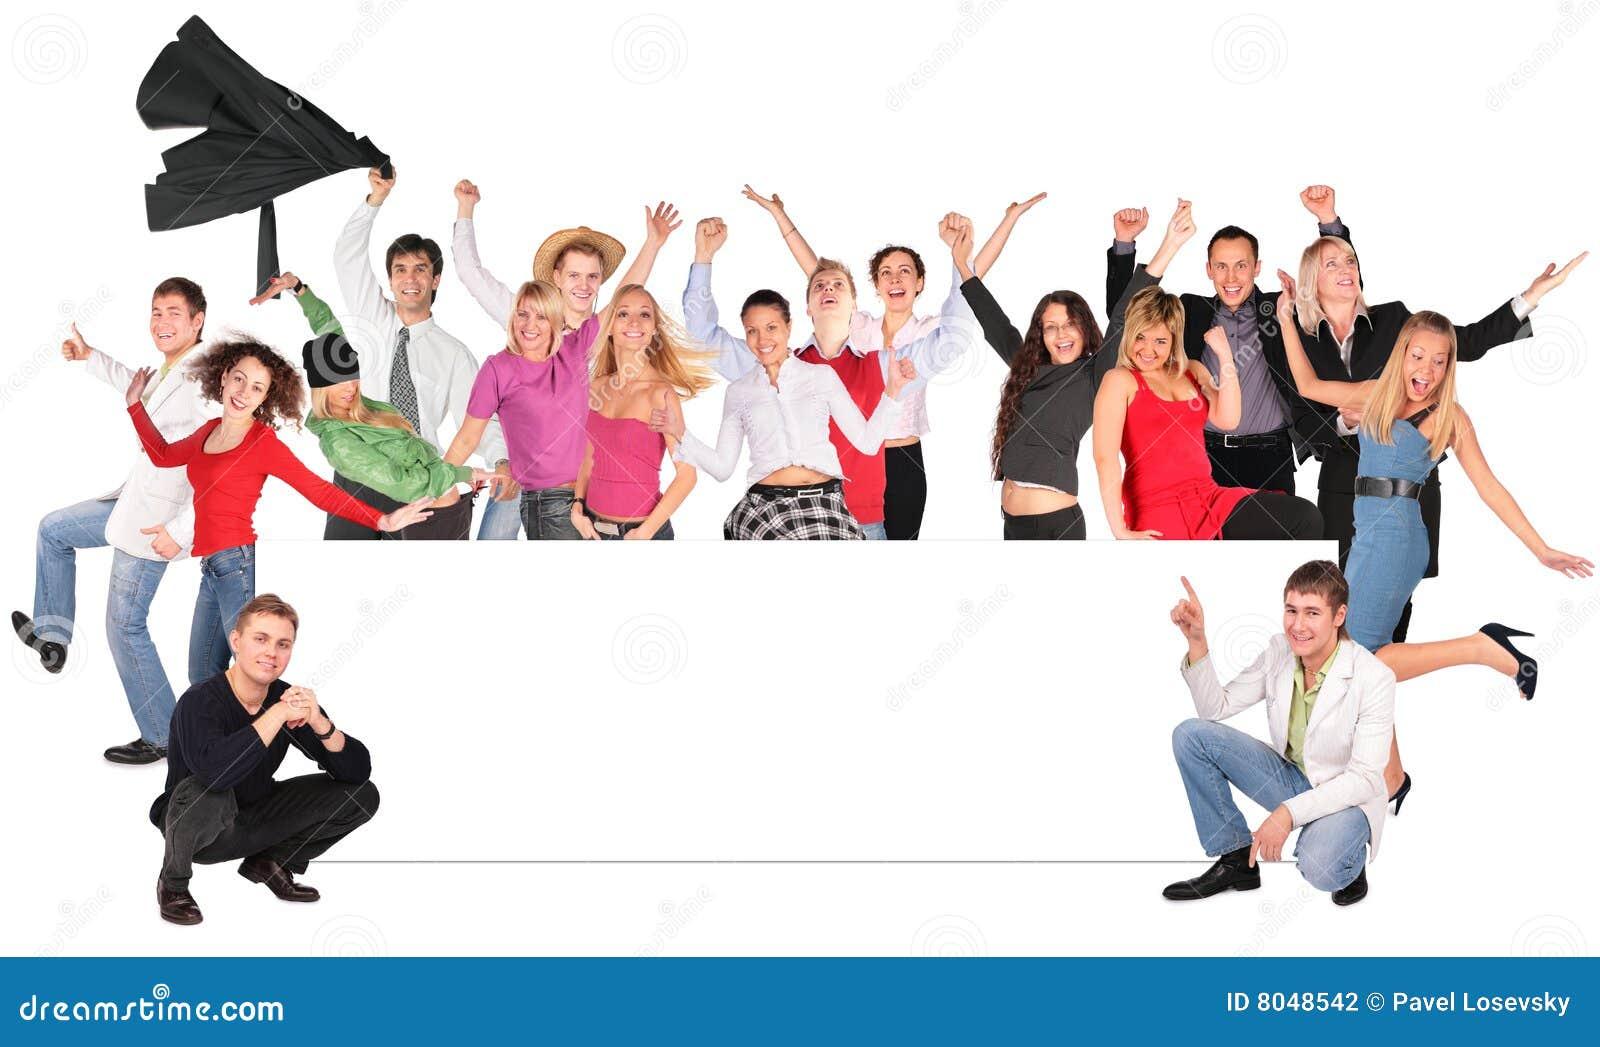 happy-people-crowd-board-text-8048542.jp